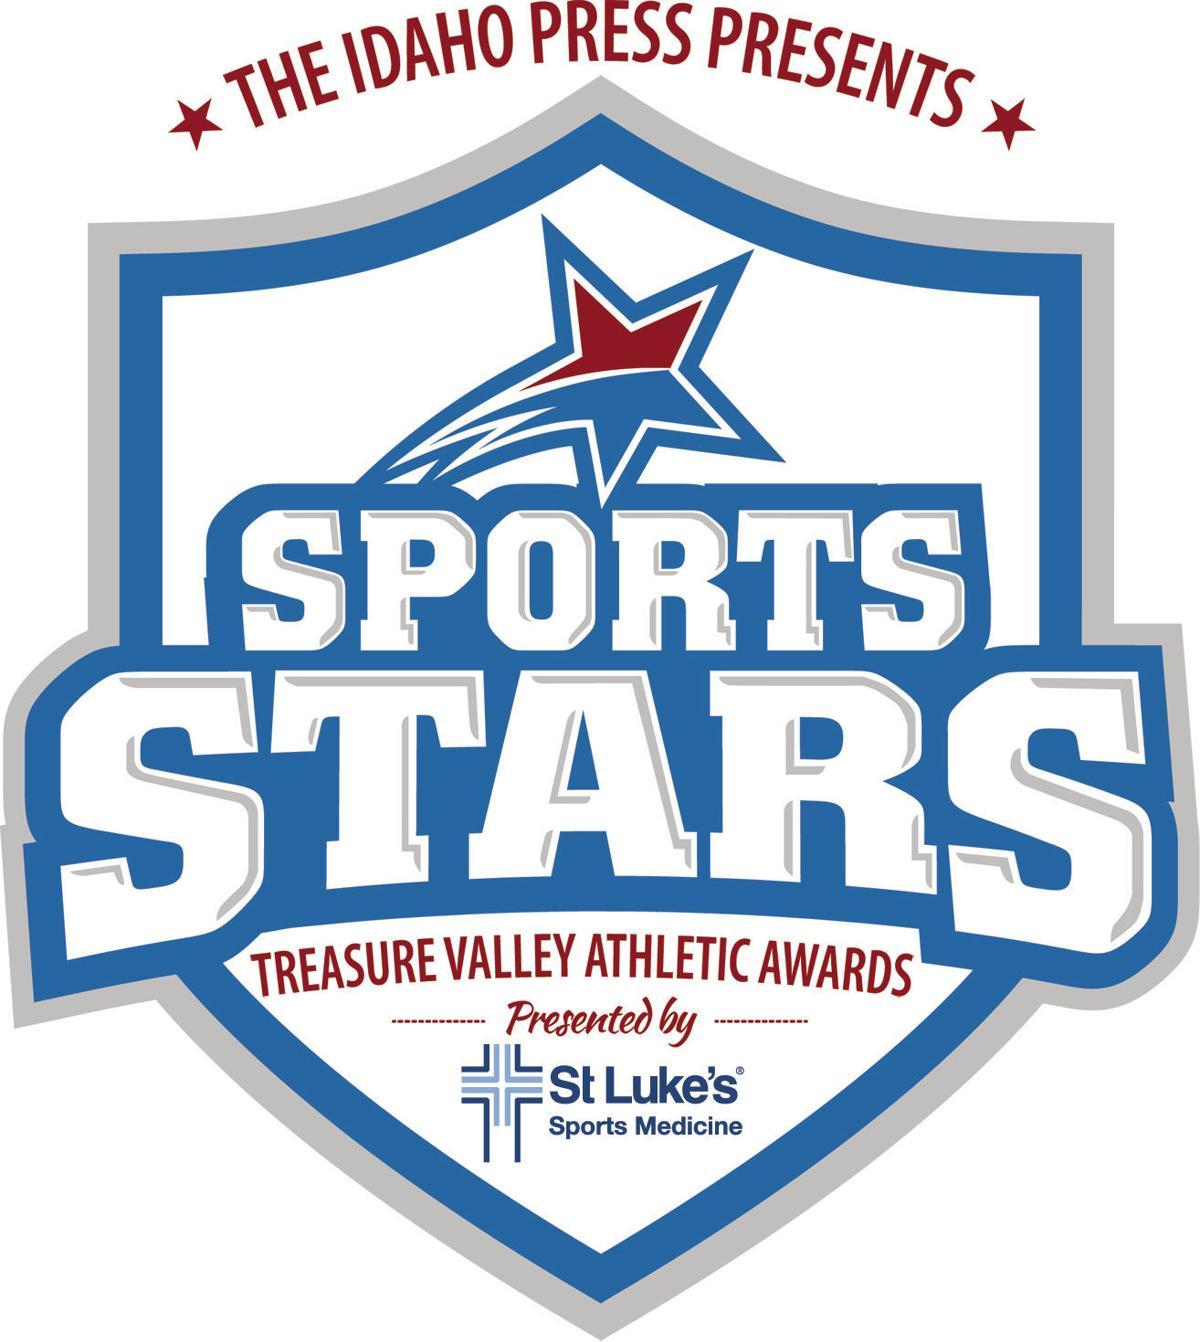 Sports Stars 2019 logo